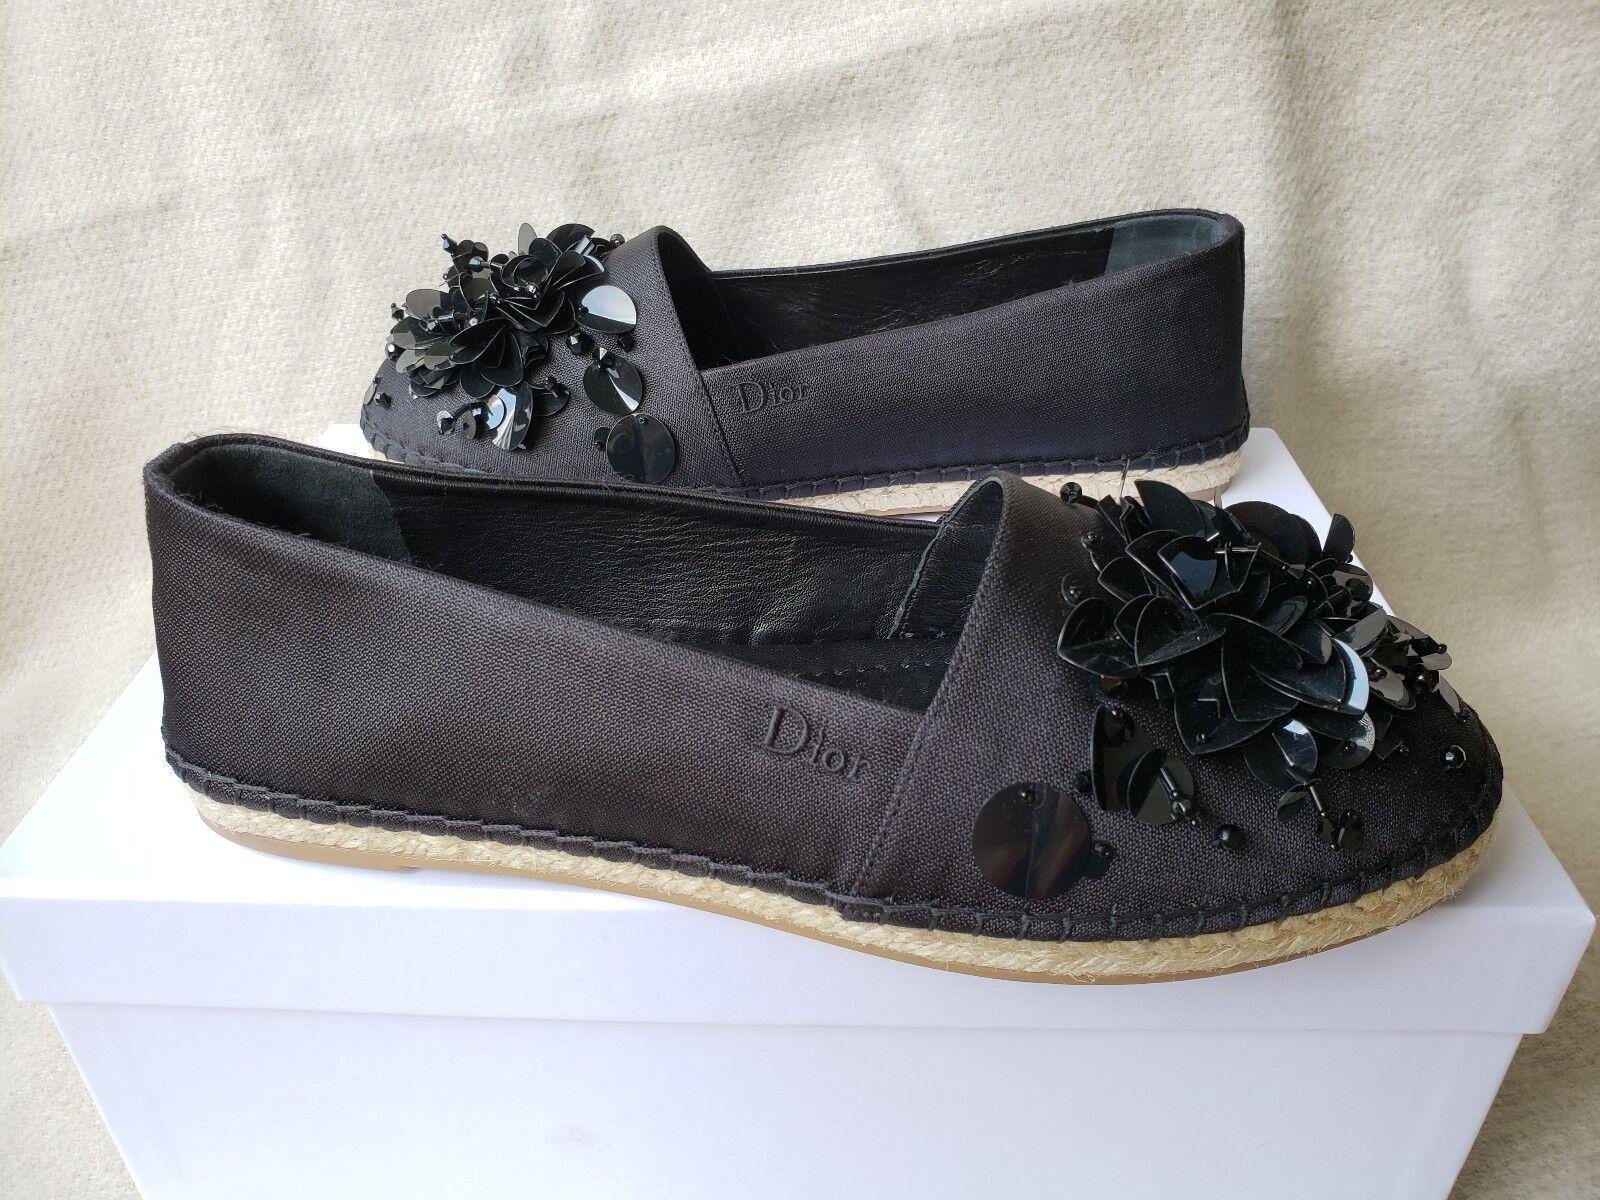 design unico NIB Christian Dior Flat Loafer Espadrille nero nero nero Canvas 39 Sunset Sequin Flower  alta qualità